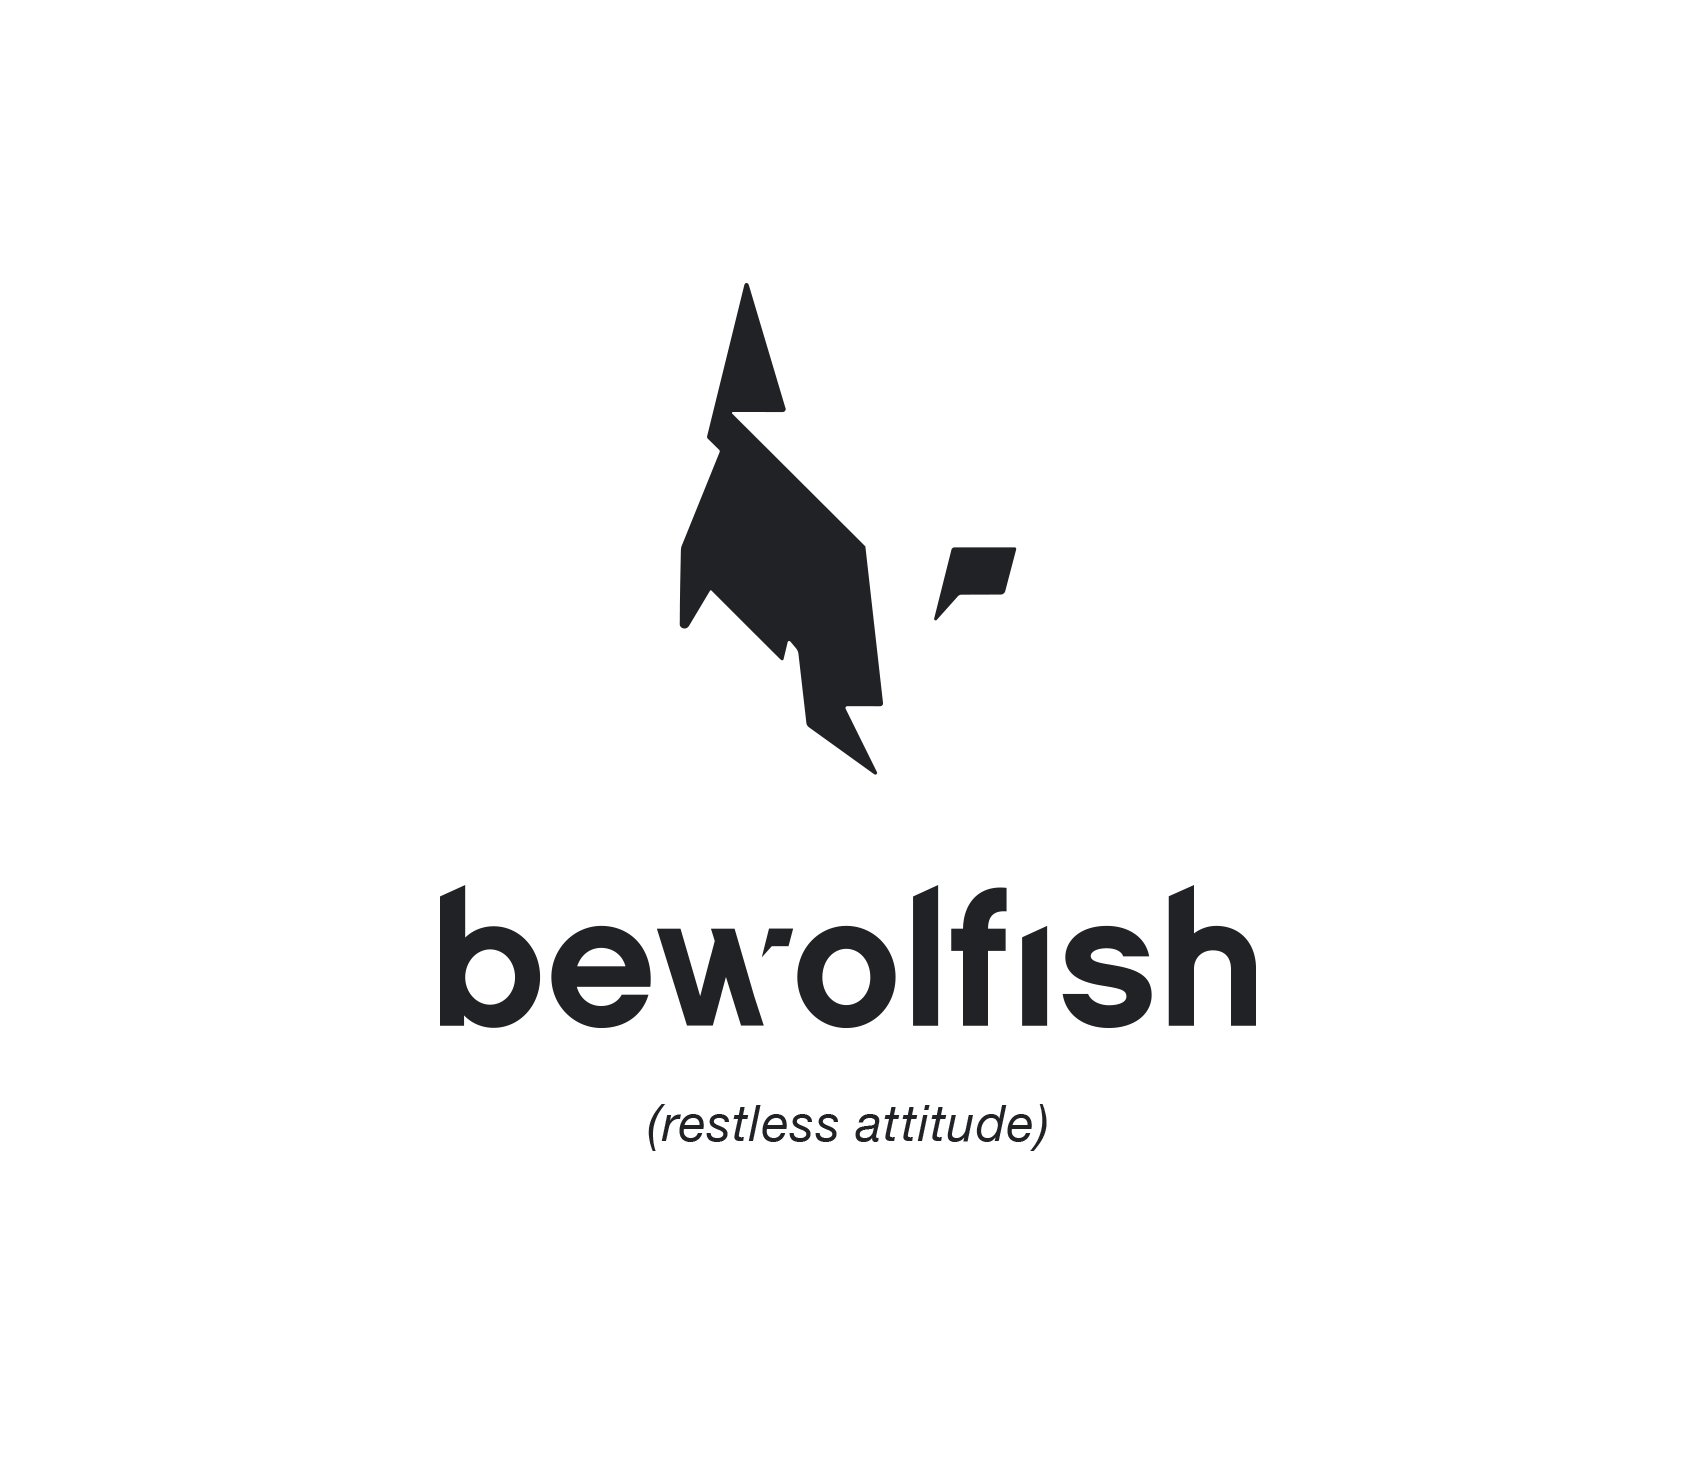 bewolfish_black